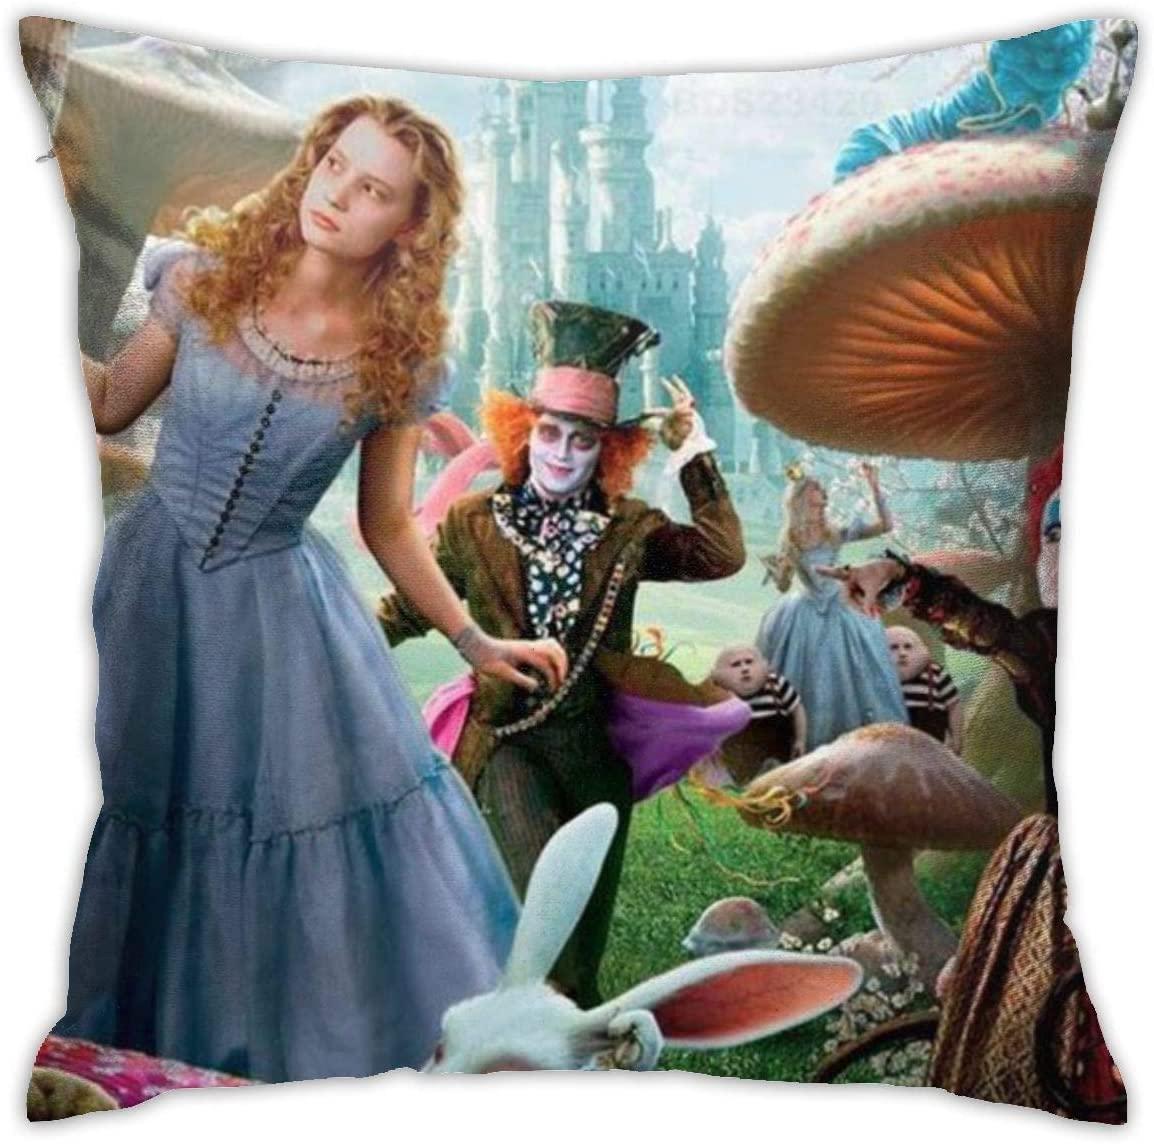 Pooizsdzzz Alice in Wonderland Pillowcase Covers 18x18 Decorative Sofa Seat Car Soft